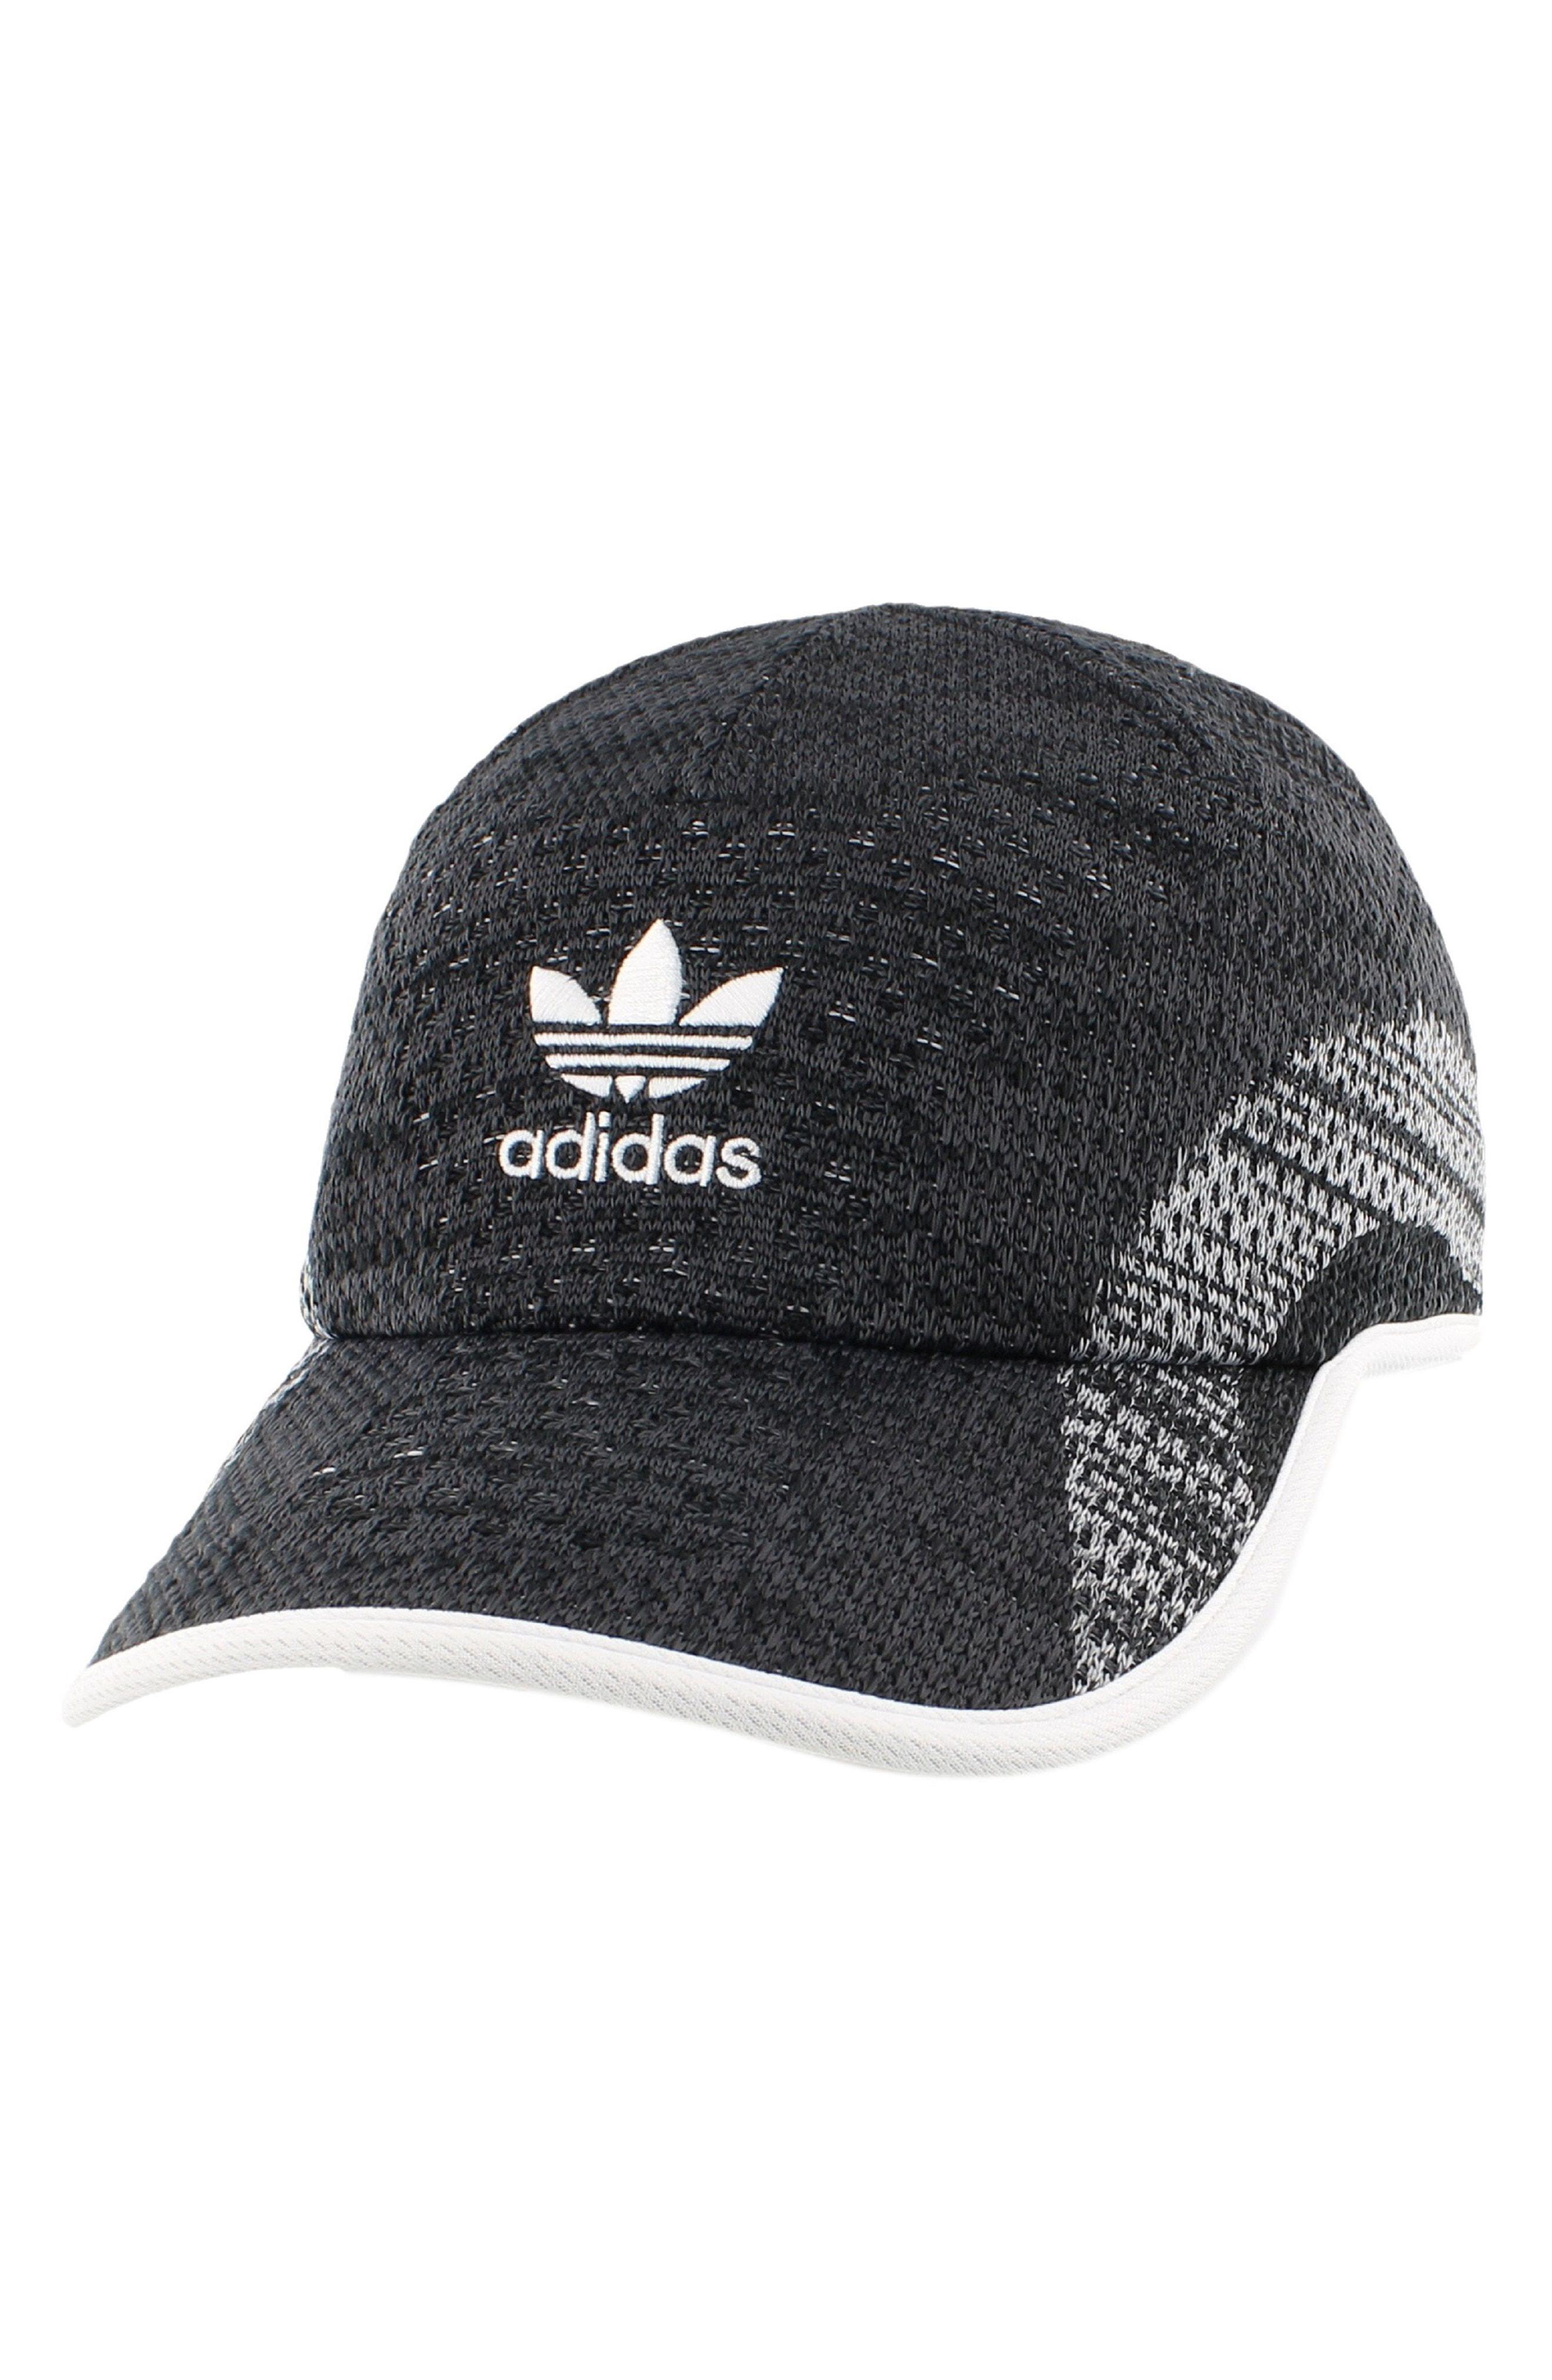 bbc6ce52c1e Lyst - adidas Originals Primeknit Ball Cap - for Men